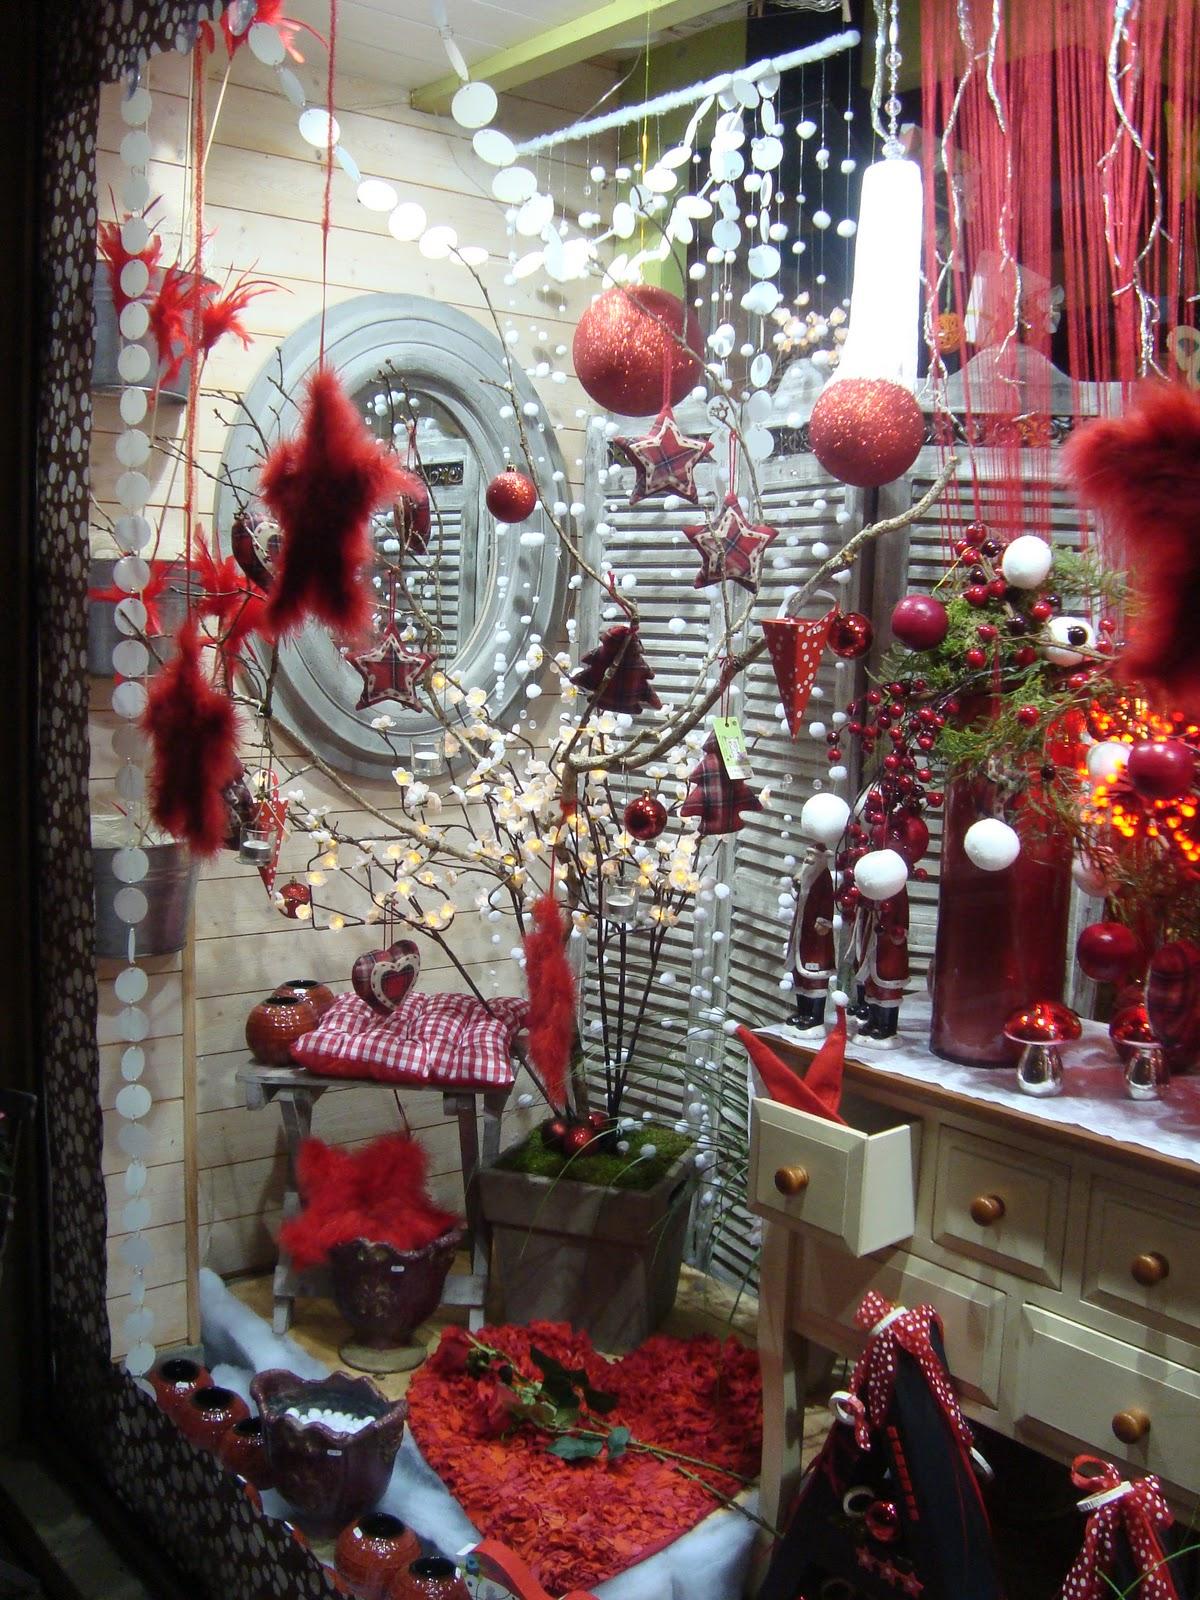 Extrêmement Maître artisan fleuriste: vitrine de Noël 2011 FE06